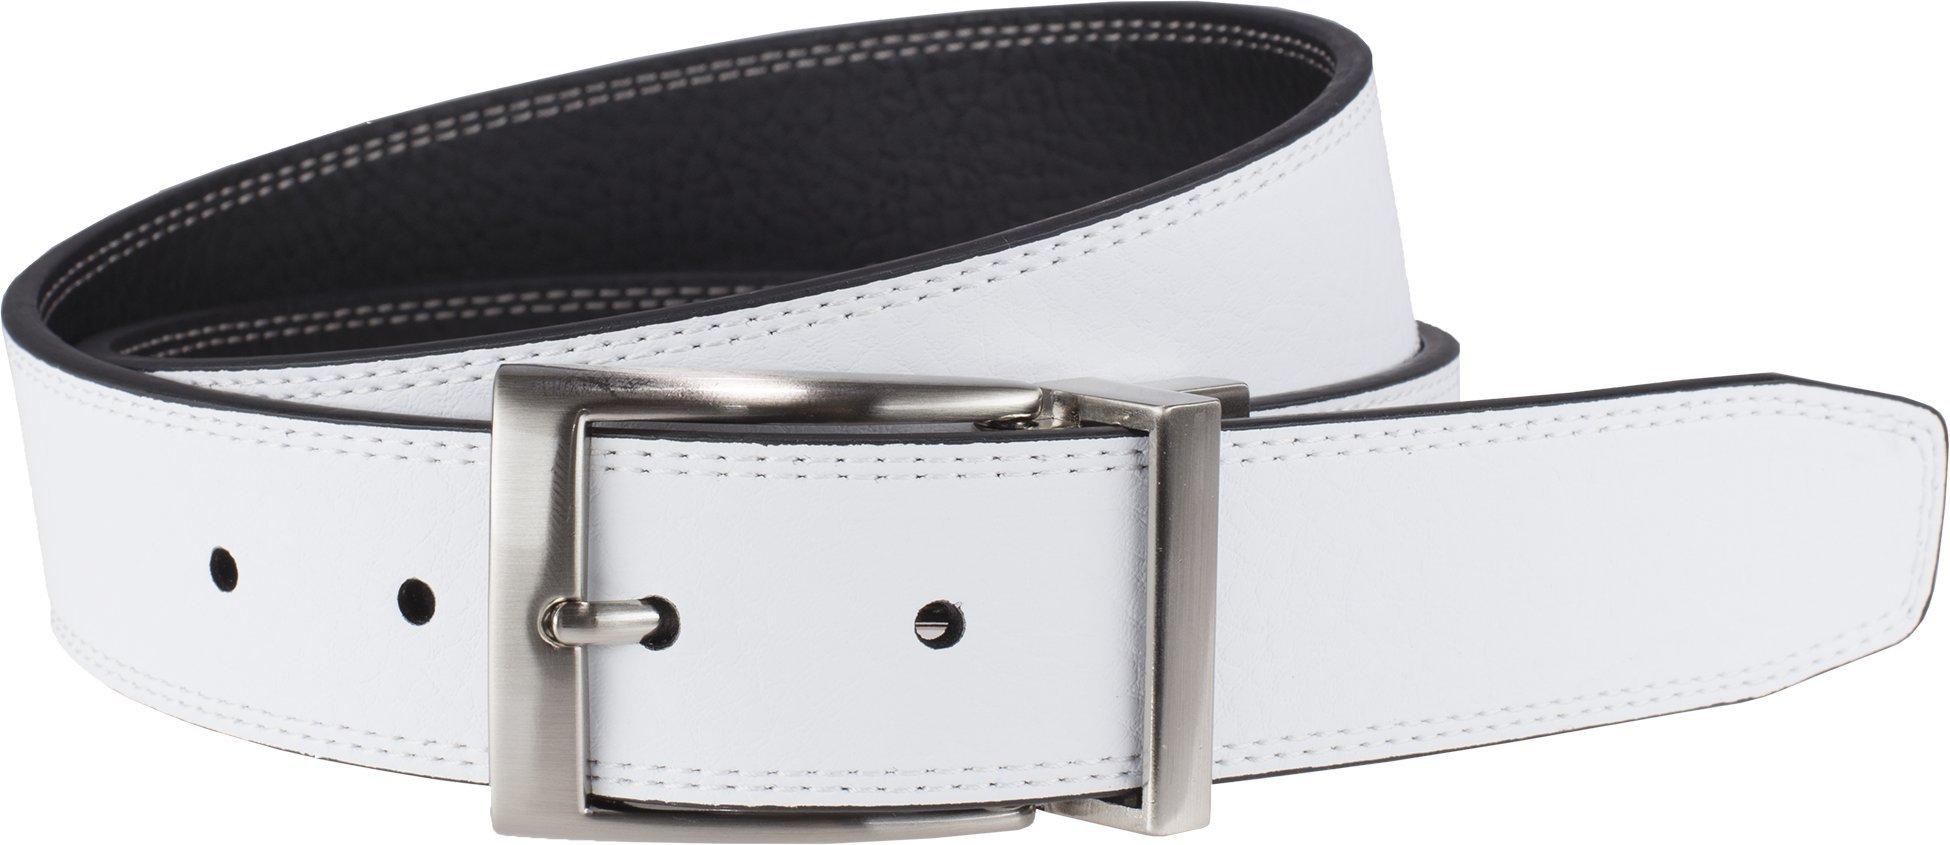 Nike Men's Classic Reversible Belt, Black/White, 34